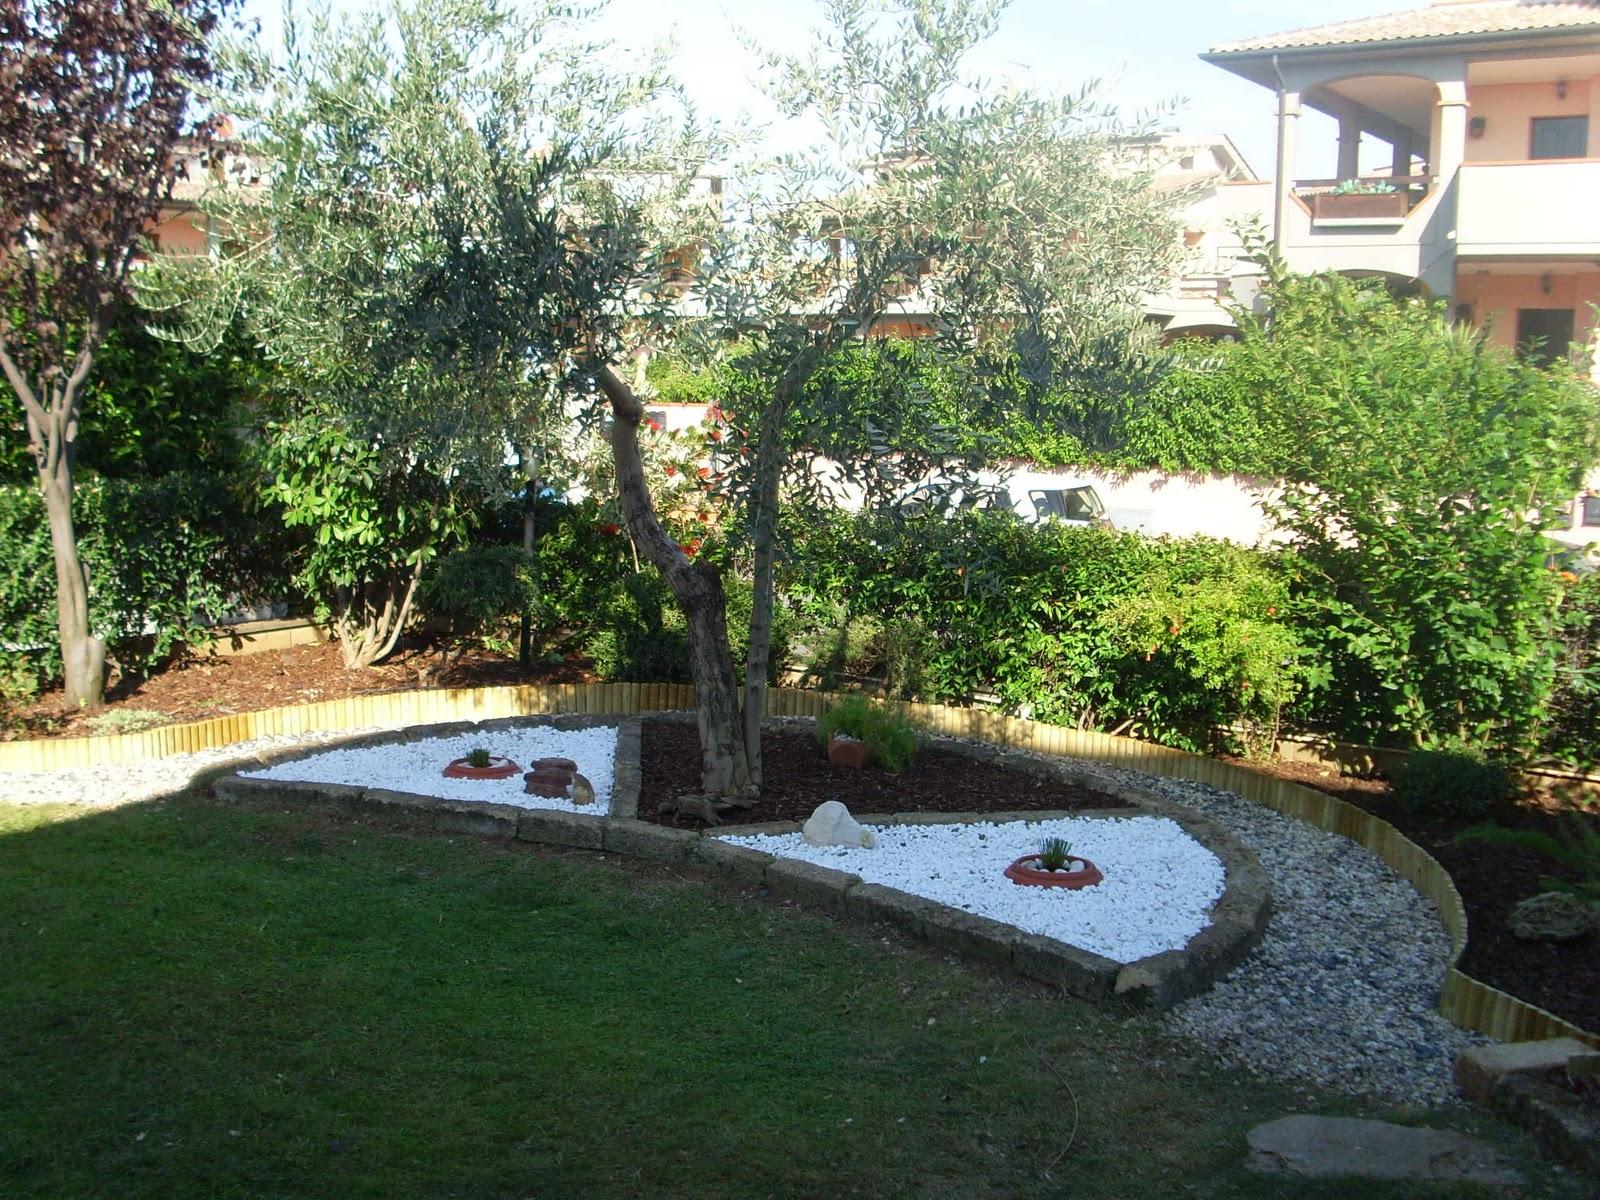 Bianca disegno cucina - Giardino con sassi bianchi ...